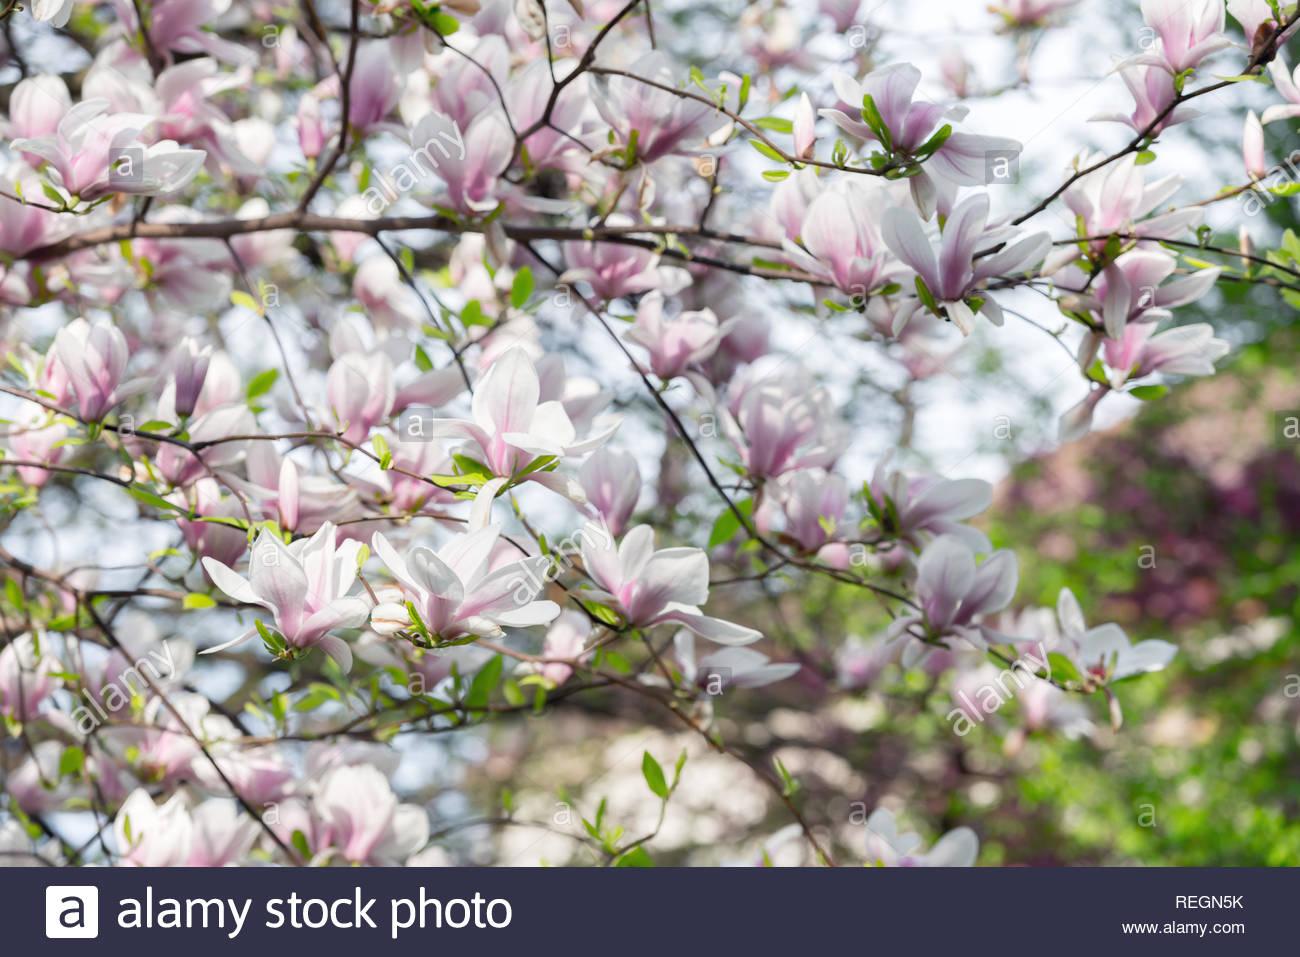 Pink magnolia flowers on spring twigs Springtime nature 1300x957